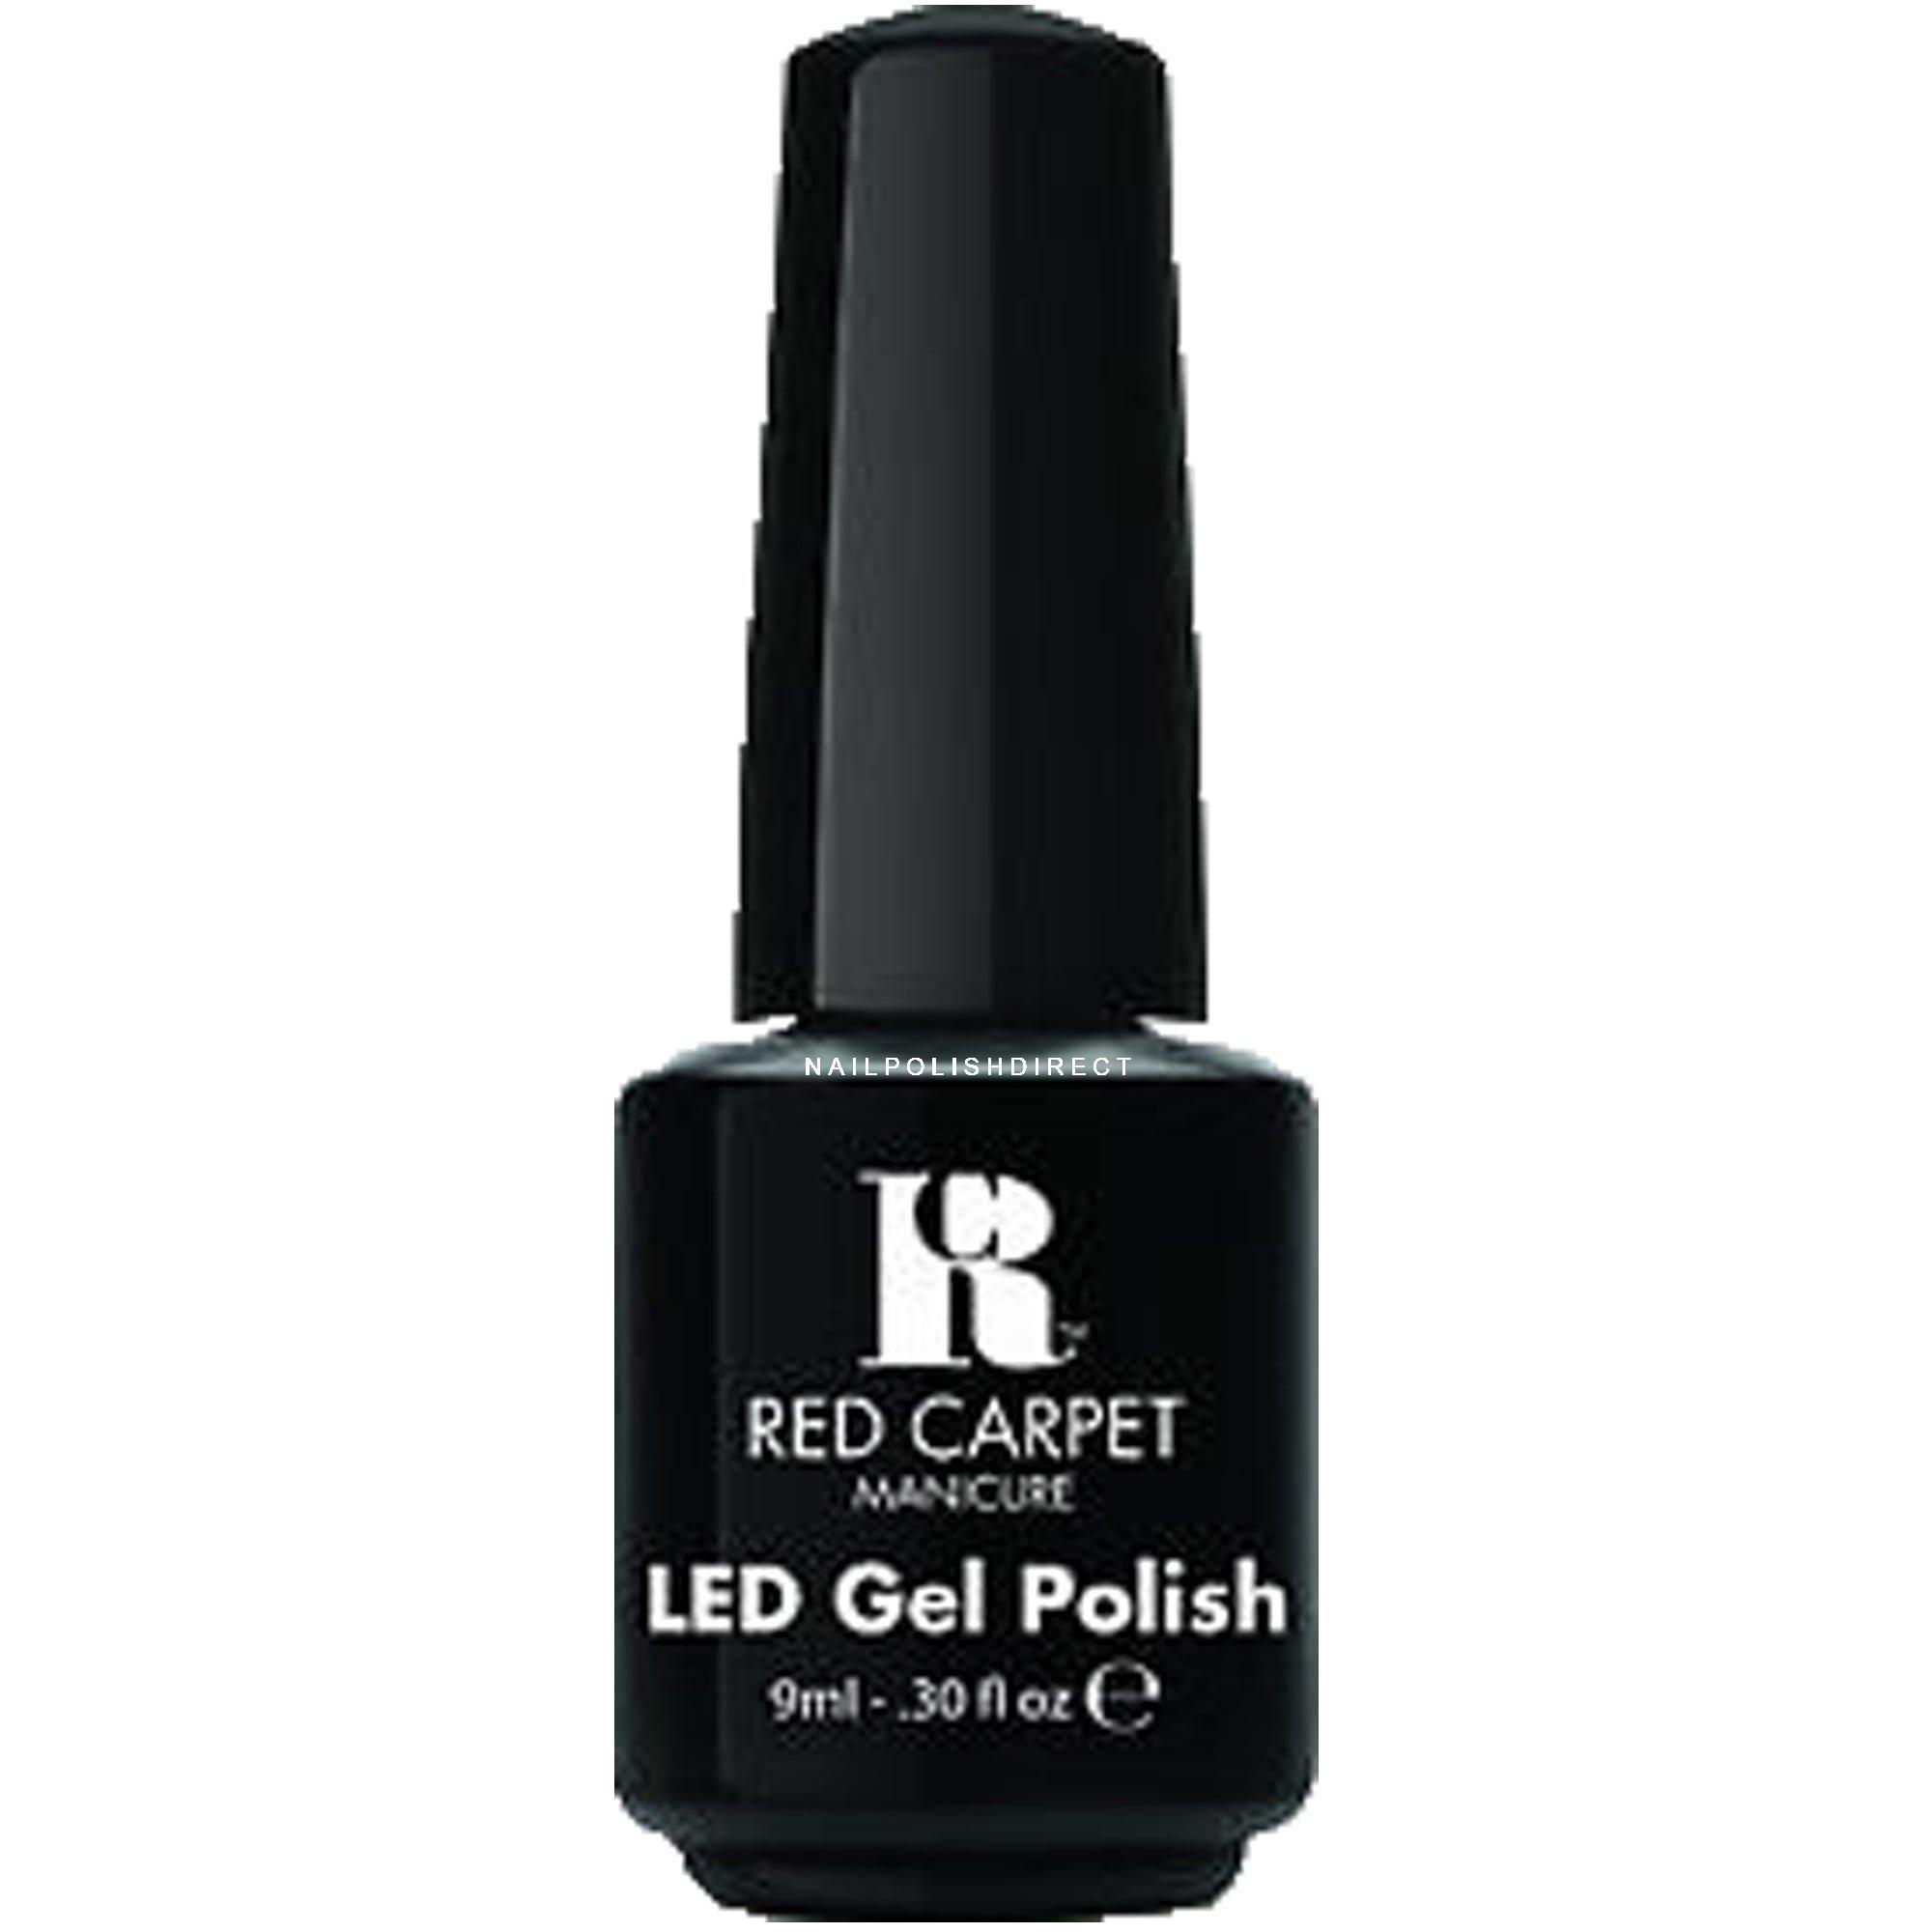 Red Carpet LED Gel Nail Polish - Black Stretch Limo 9ml | Professional